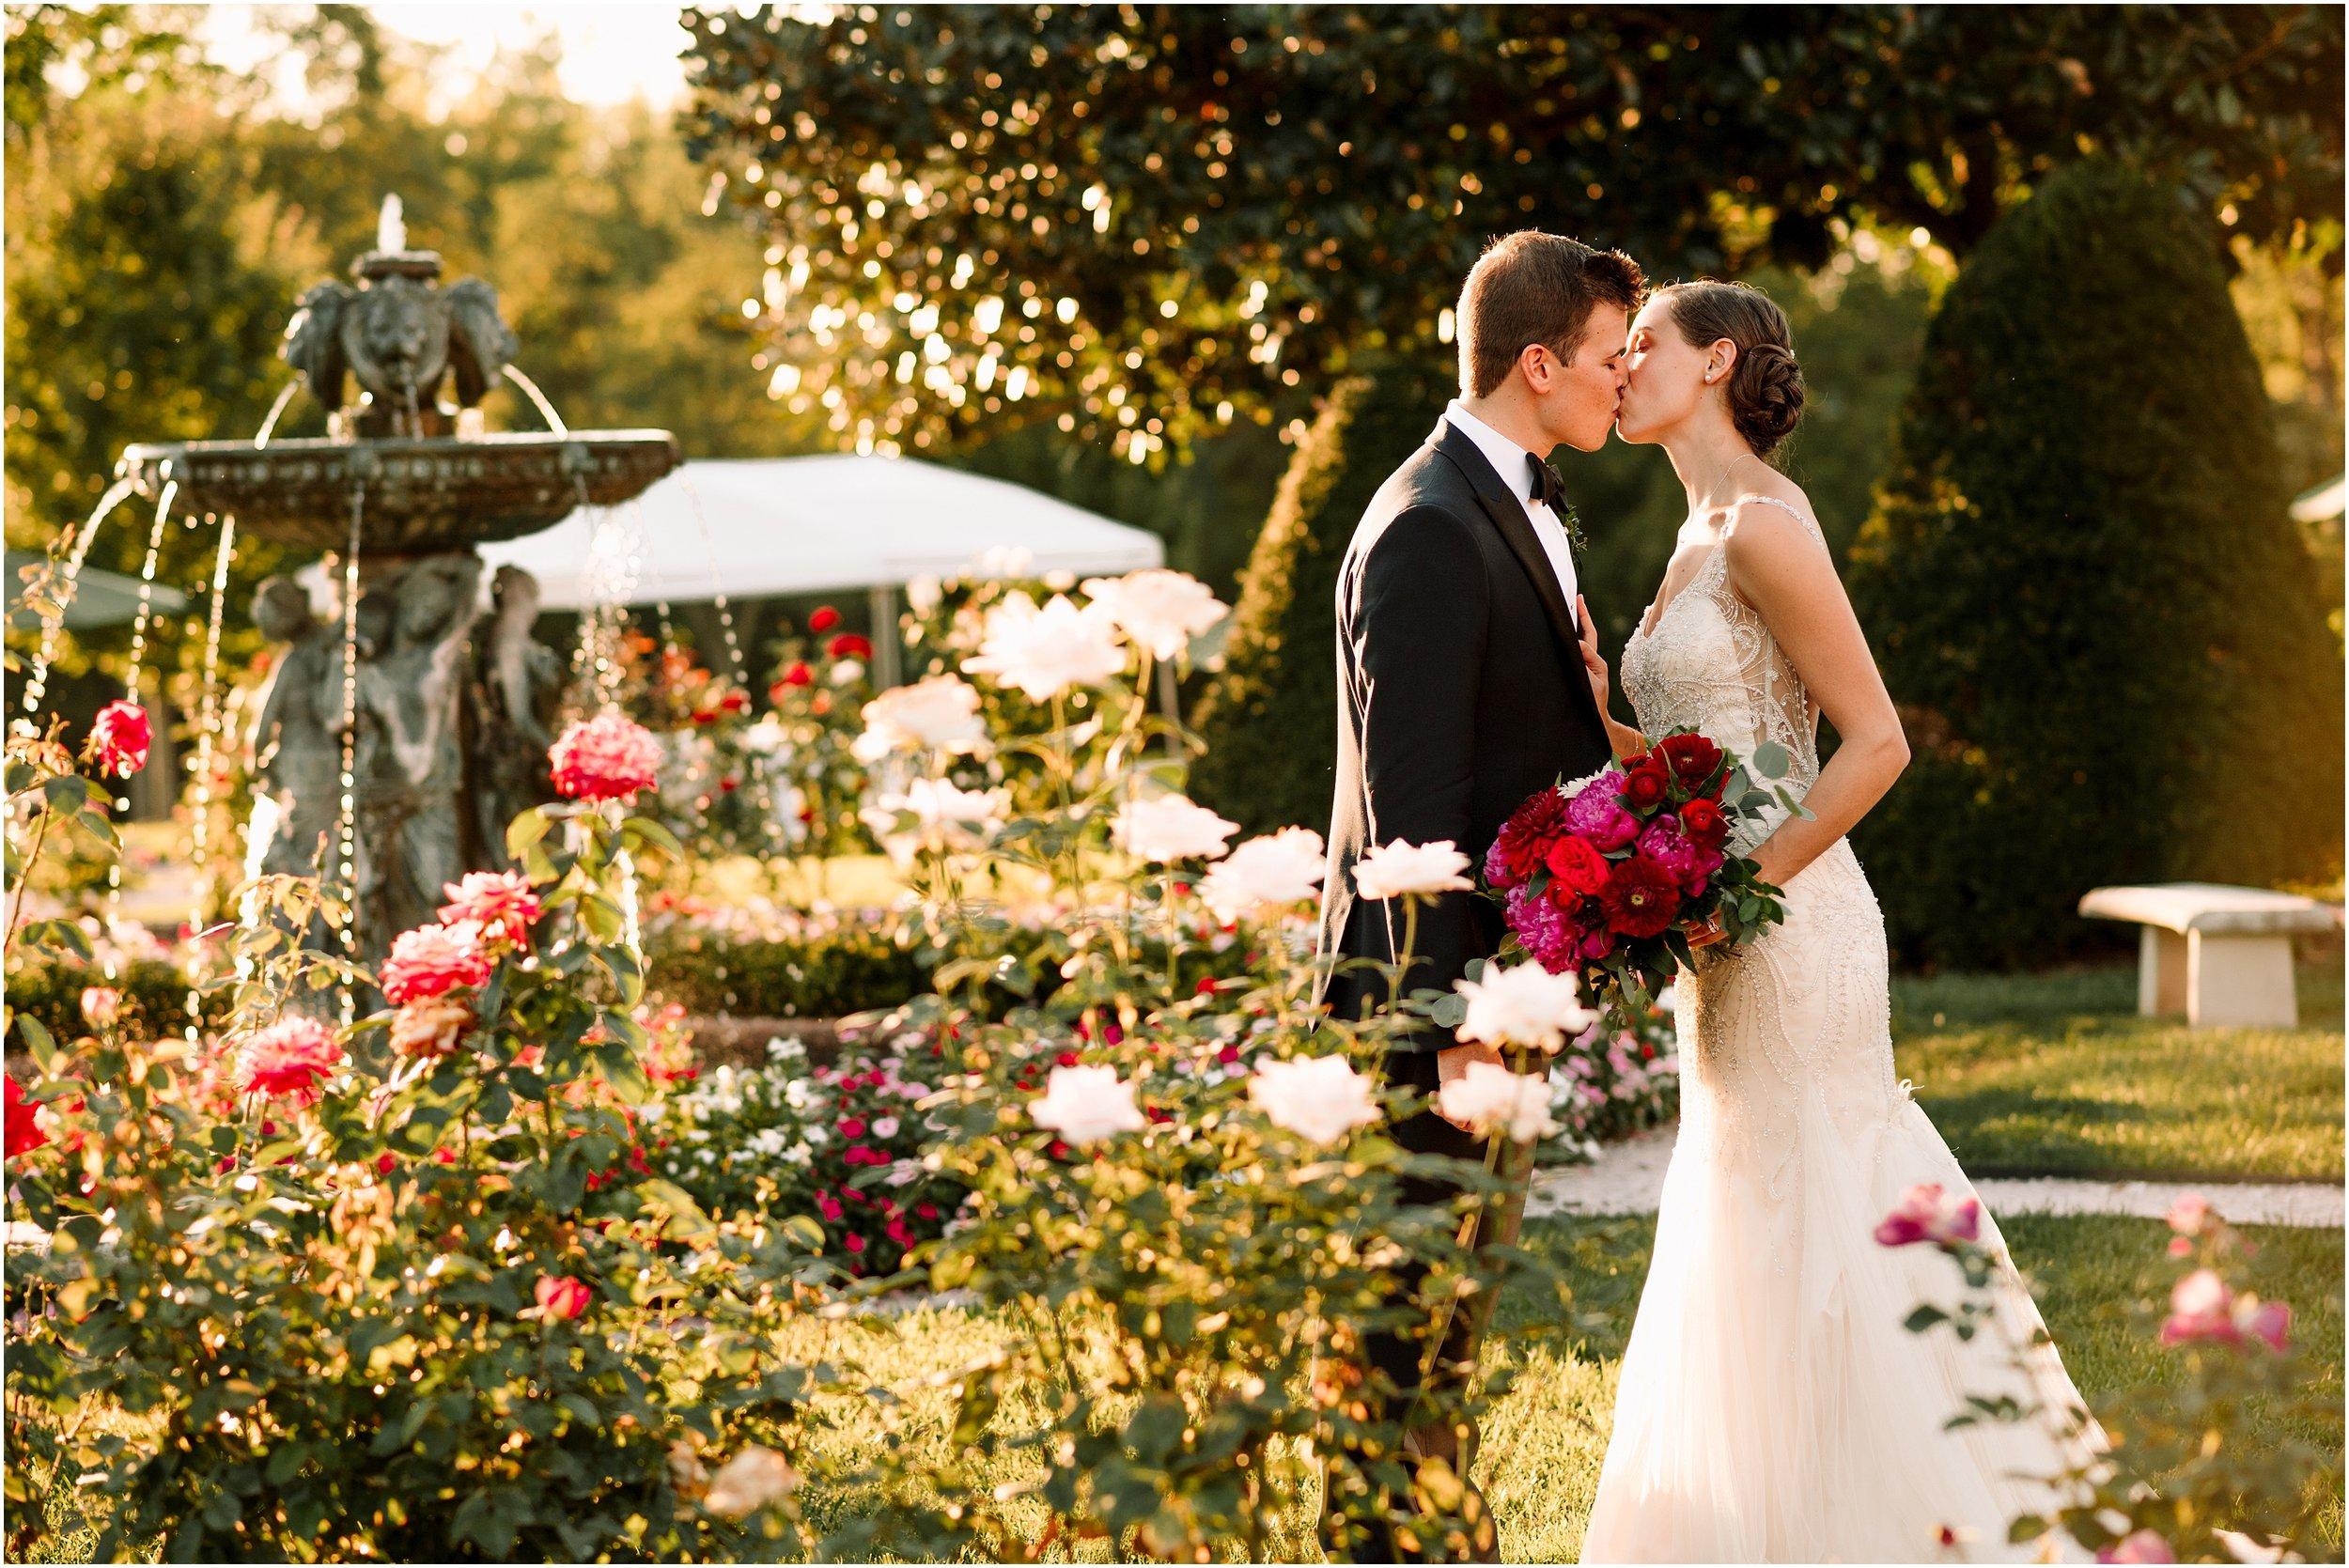 hannah leigh photography Antrim 1844 Wedding_1260.jpg